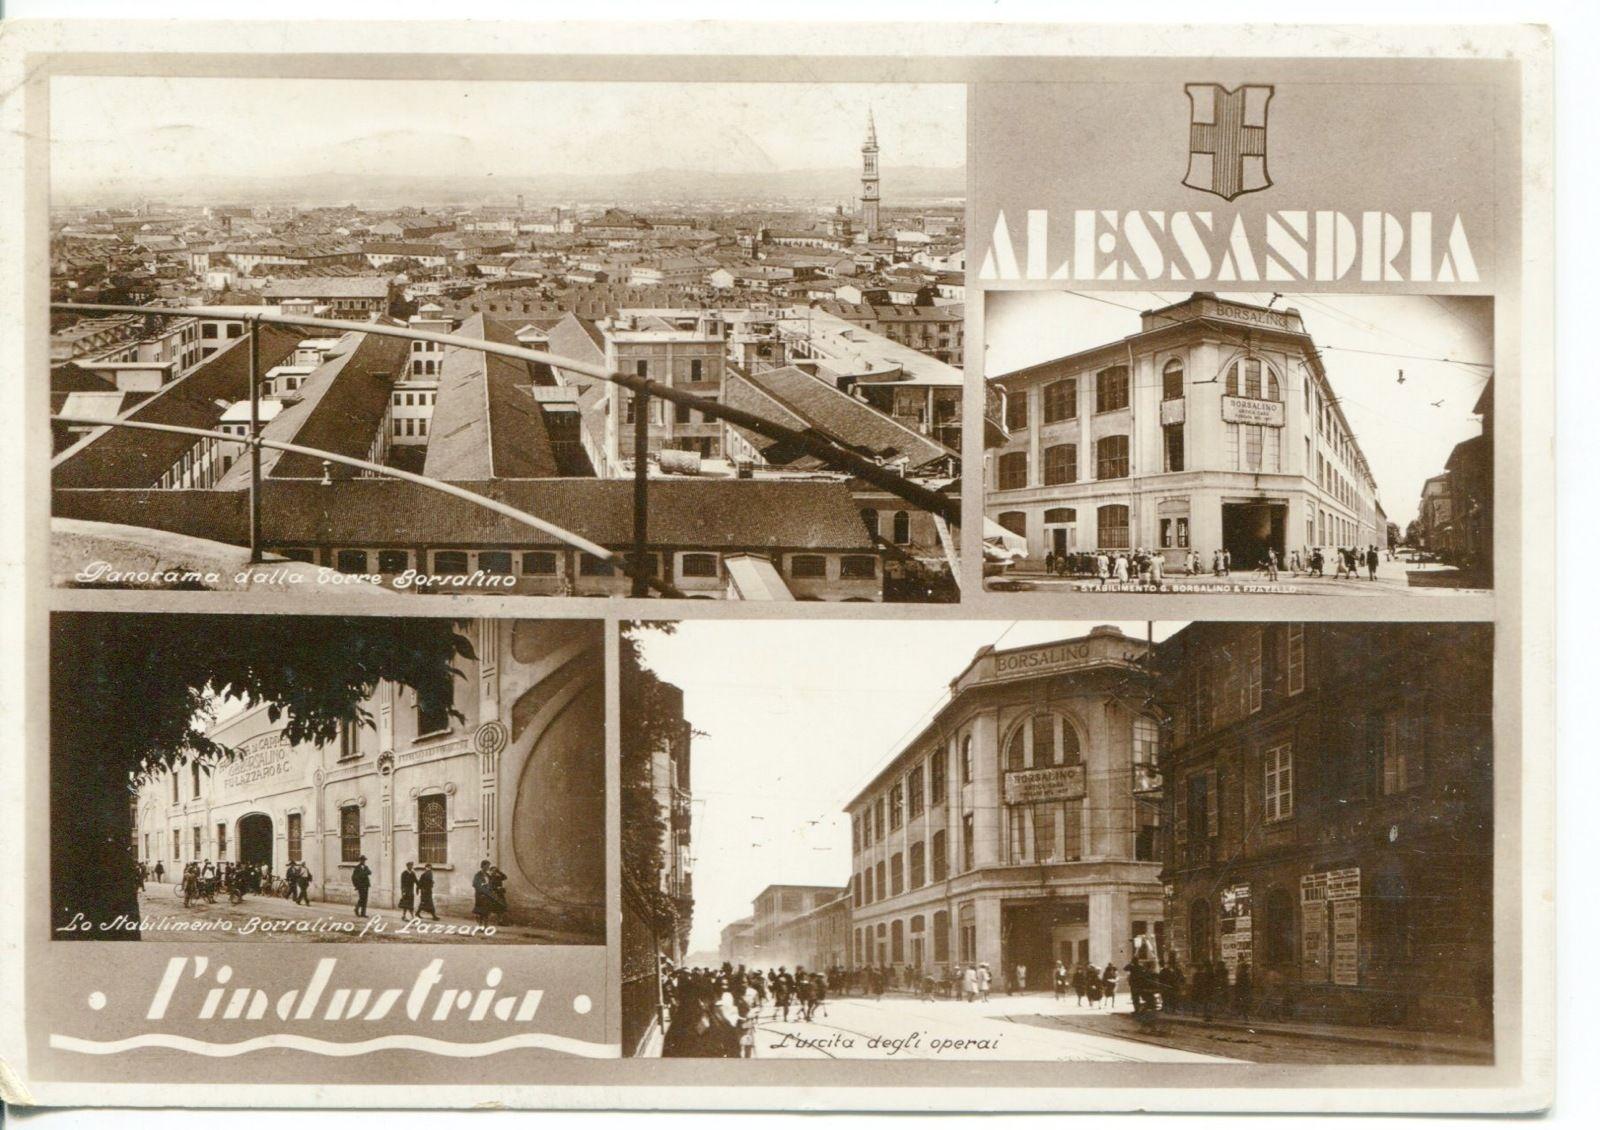 Cartolina Alessandria industria Borsalino cappelli viagg 1935